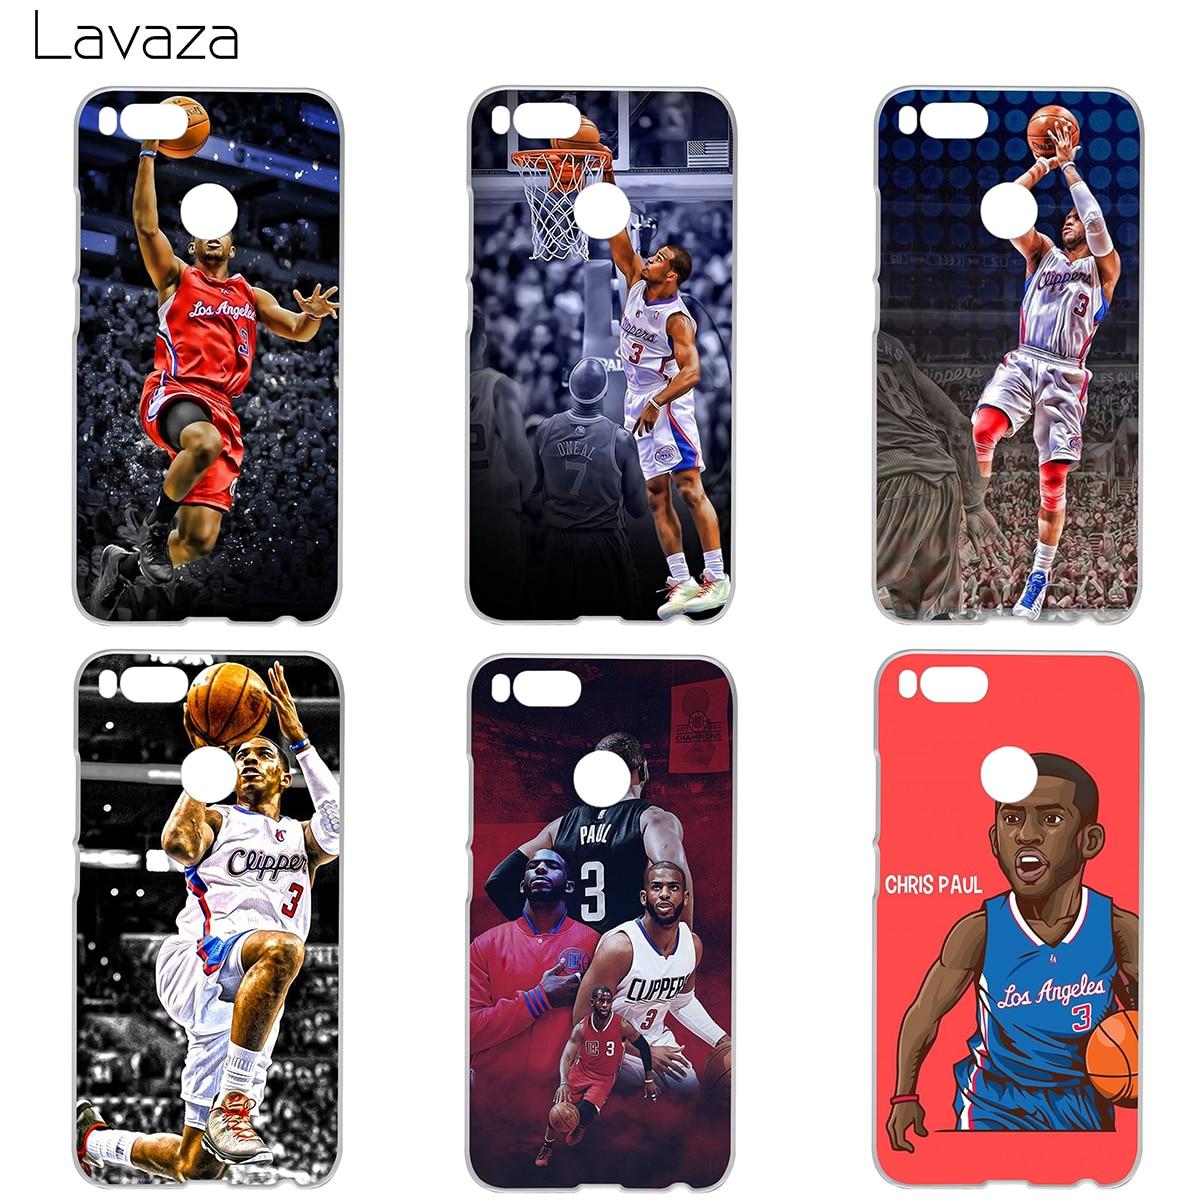 Lavaza Энтони Дэвис Блейк Кармело Энтони Крис Пол чехол для Xiaomi Redmi Note 3 3 S 5 5A Pro премьер